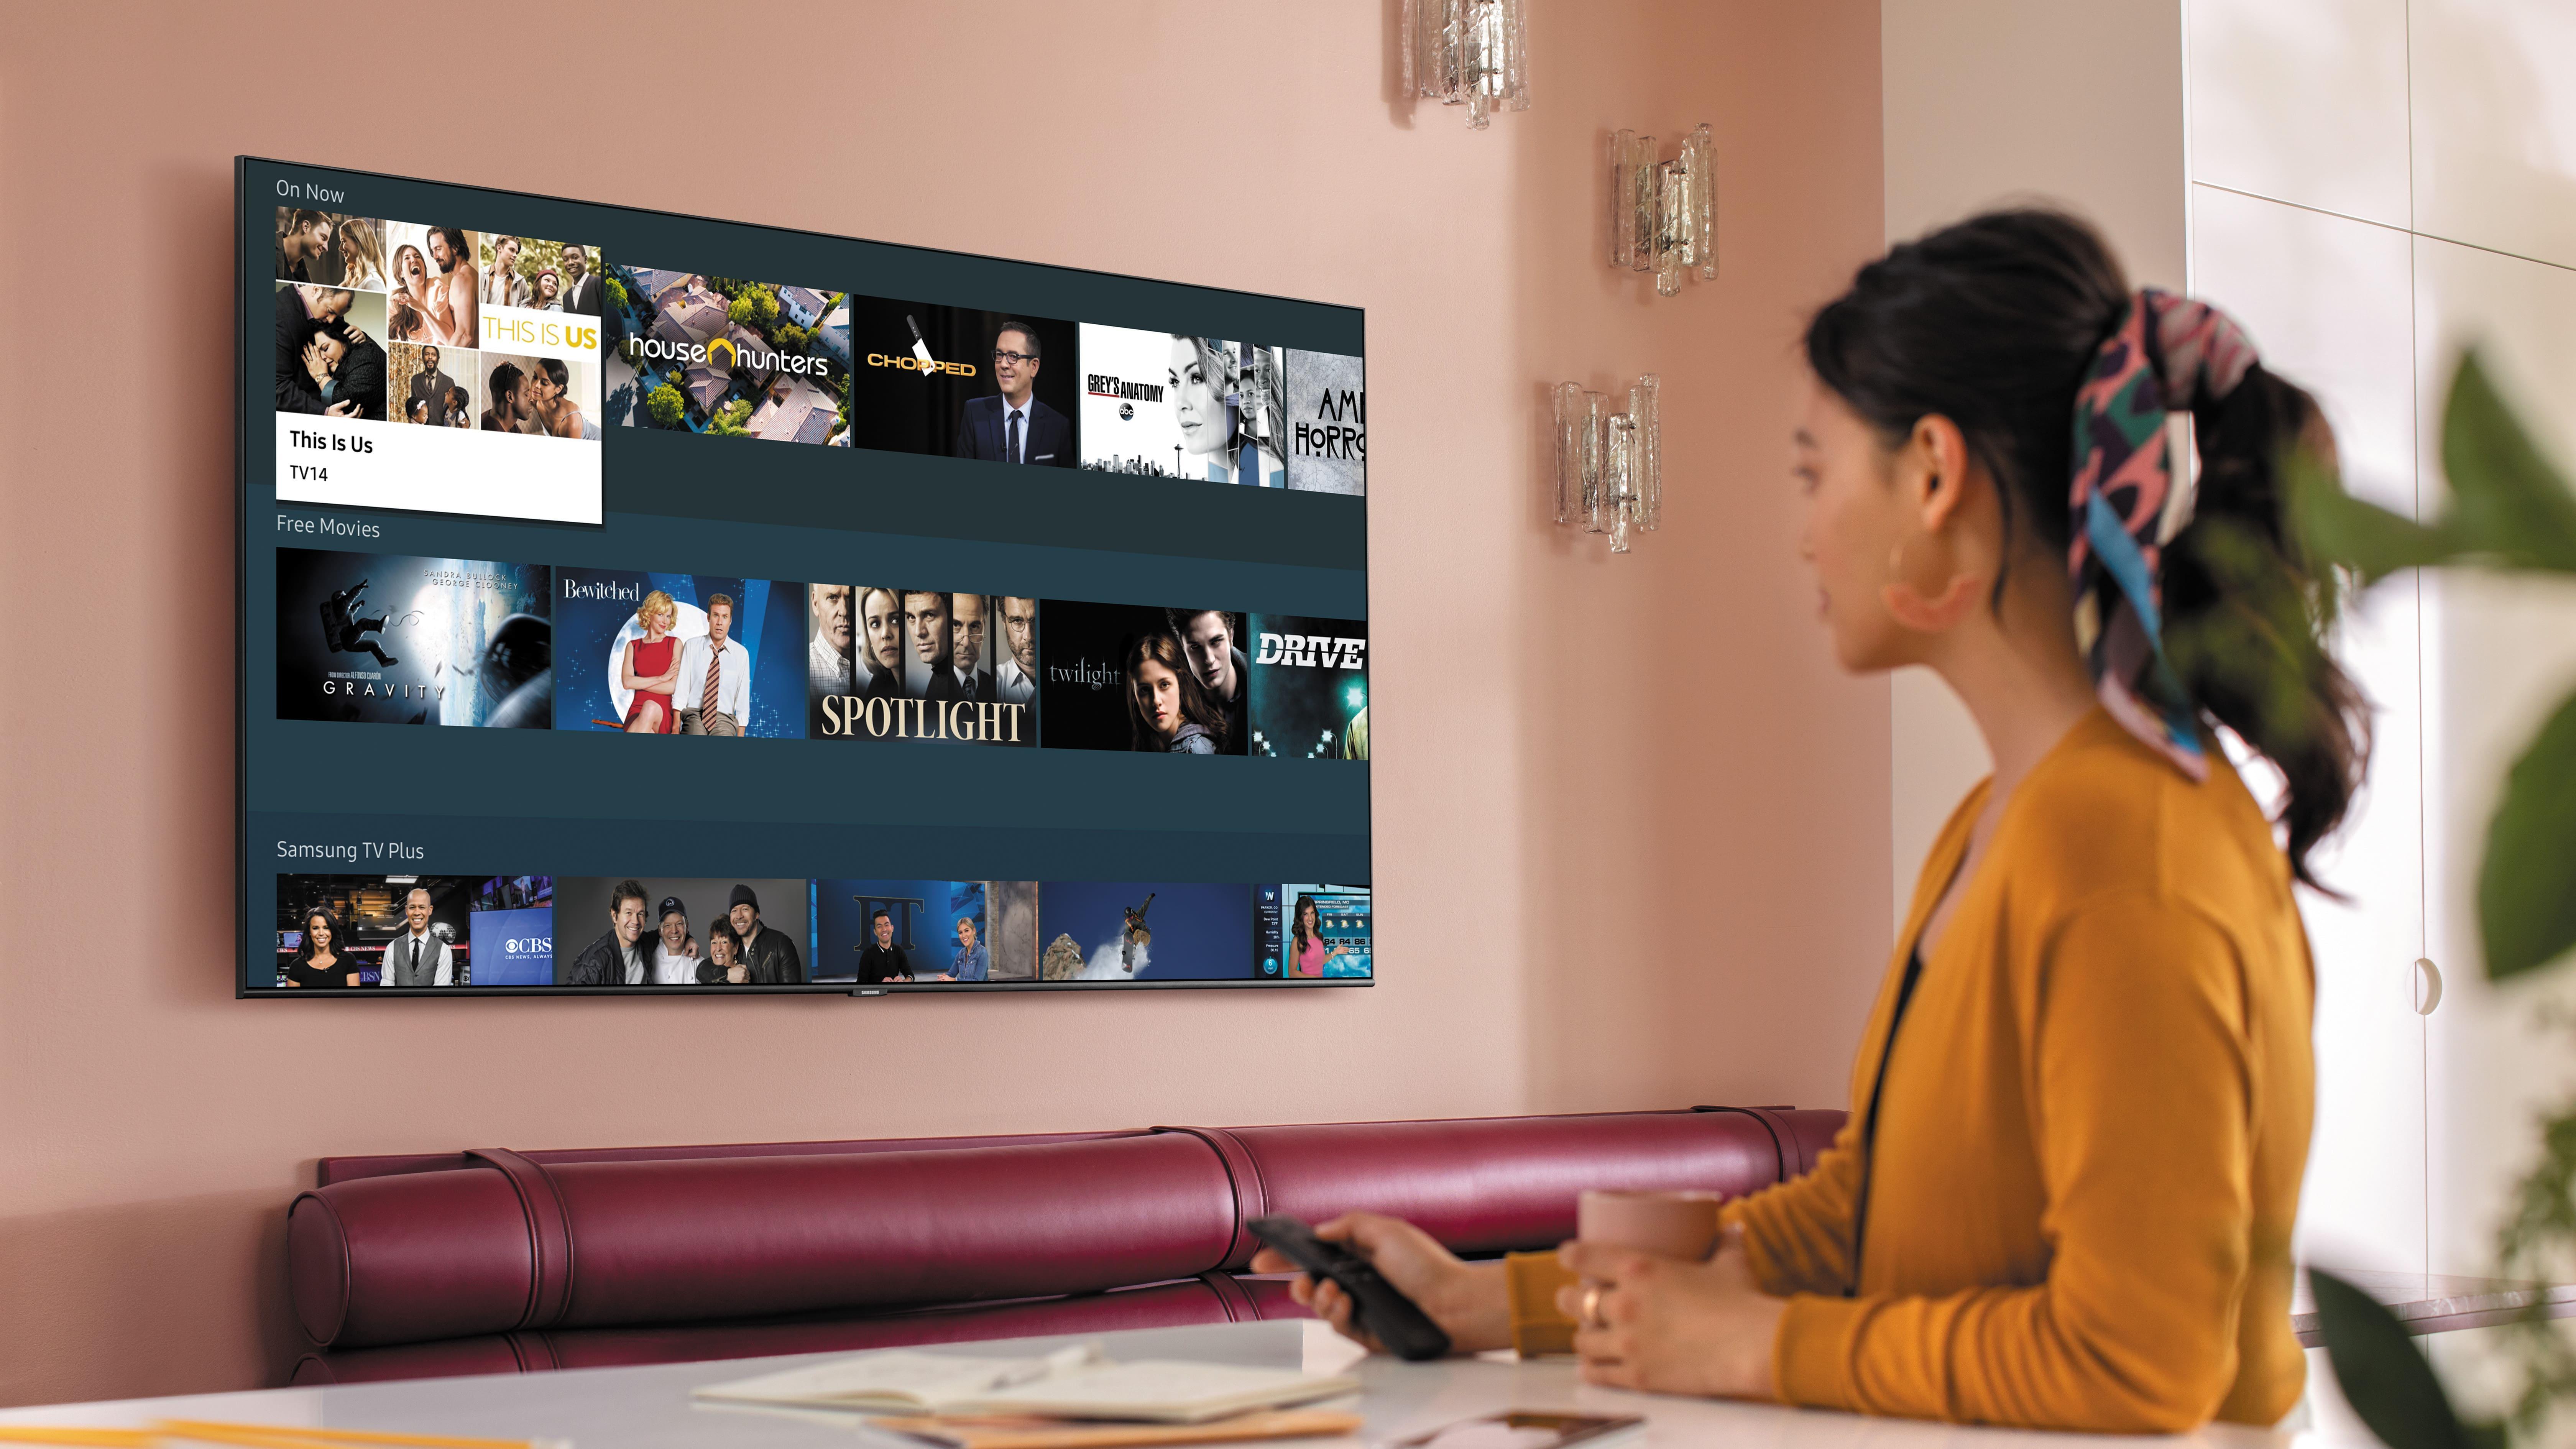 Best Smart Tvs 2021 New Samsung TV 2020: what's new this year? | TechRadar